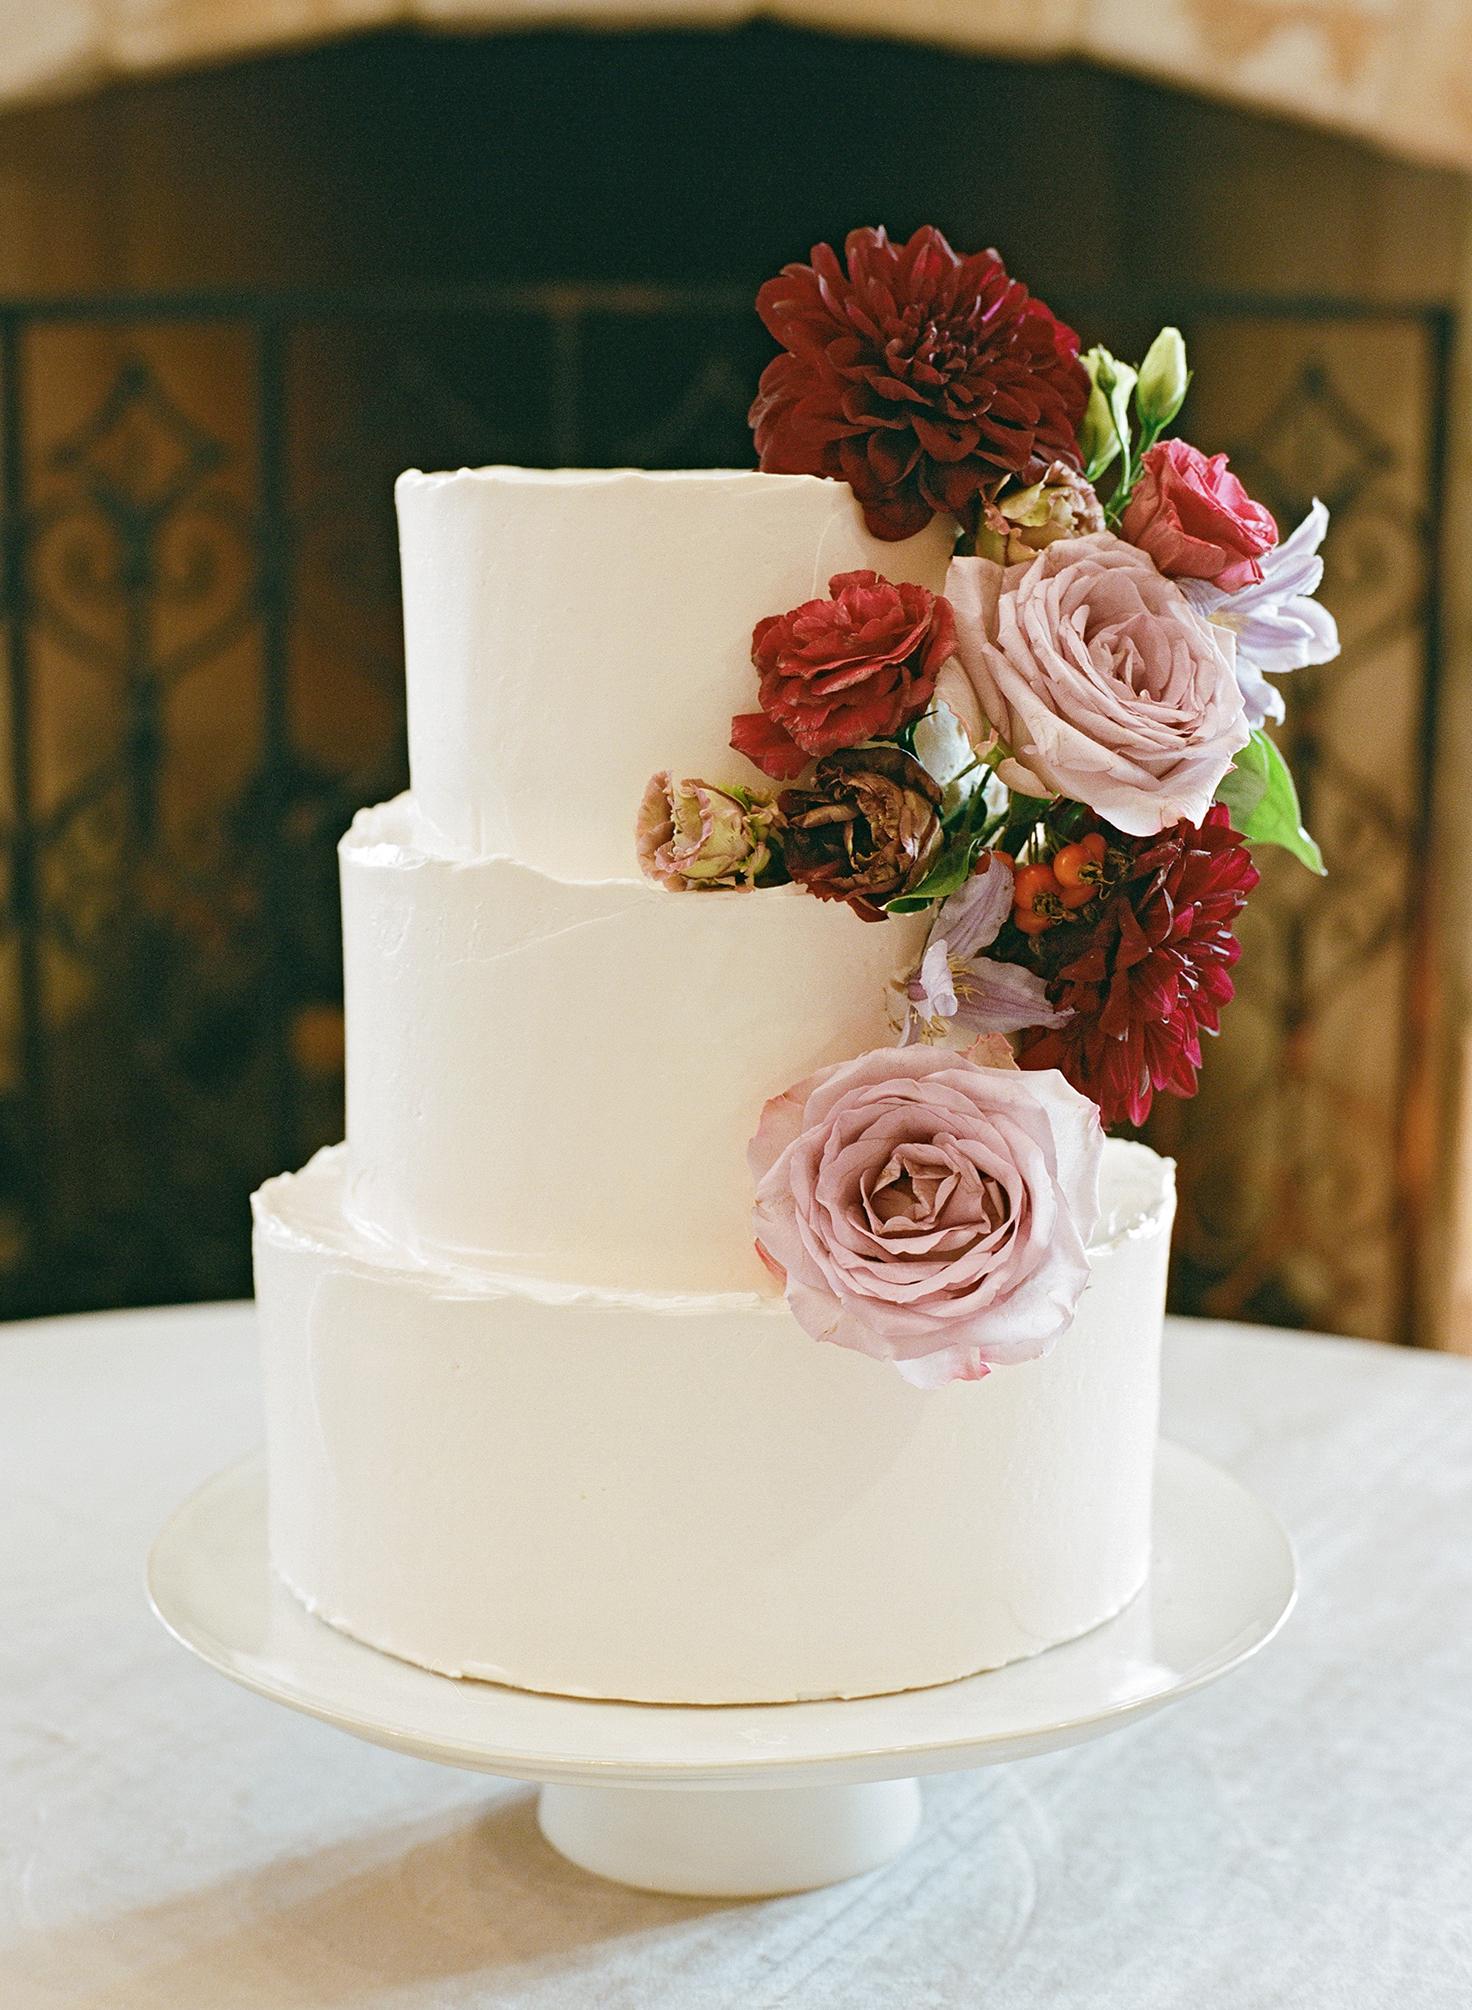 ivana nevin wedding cake with flowers